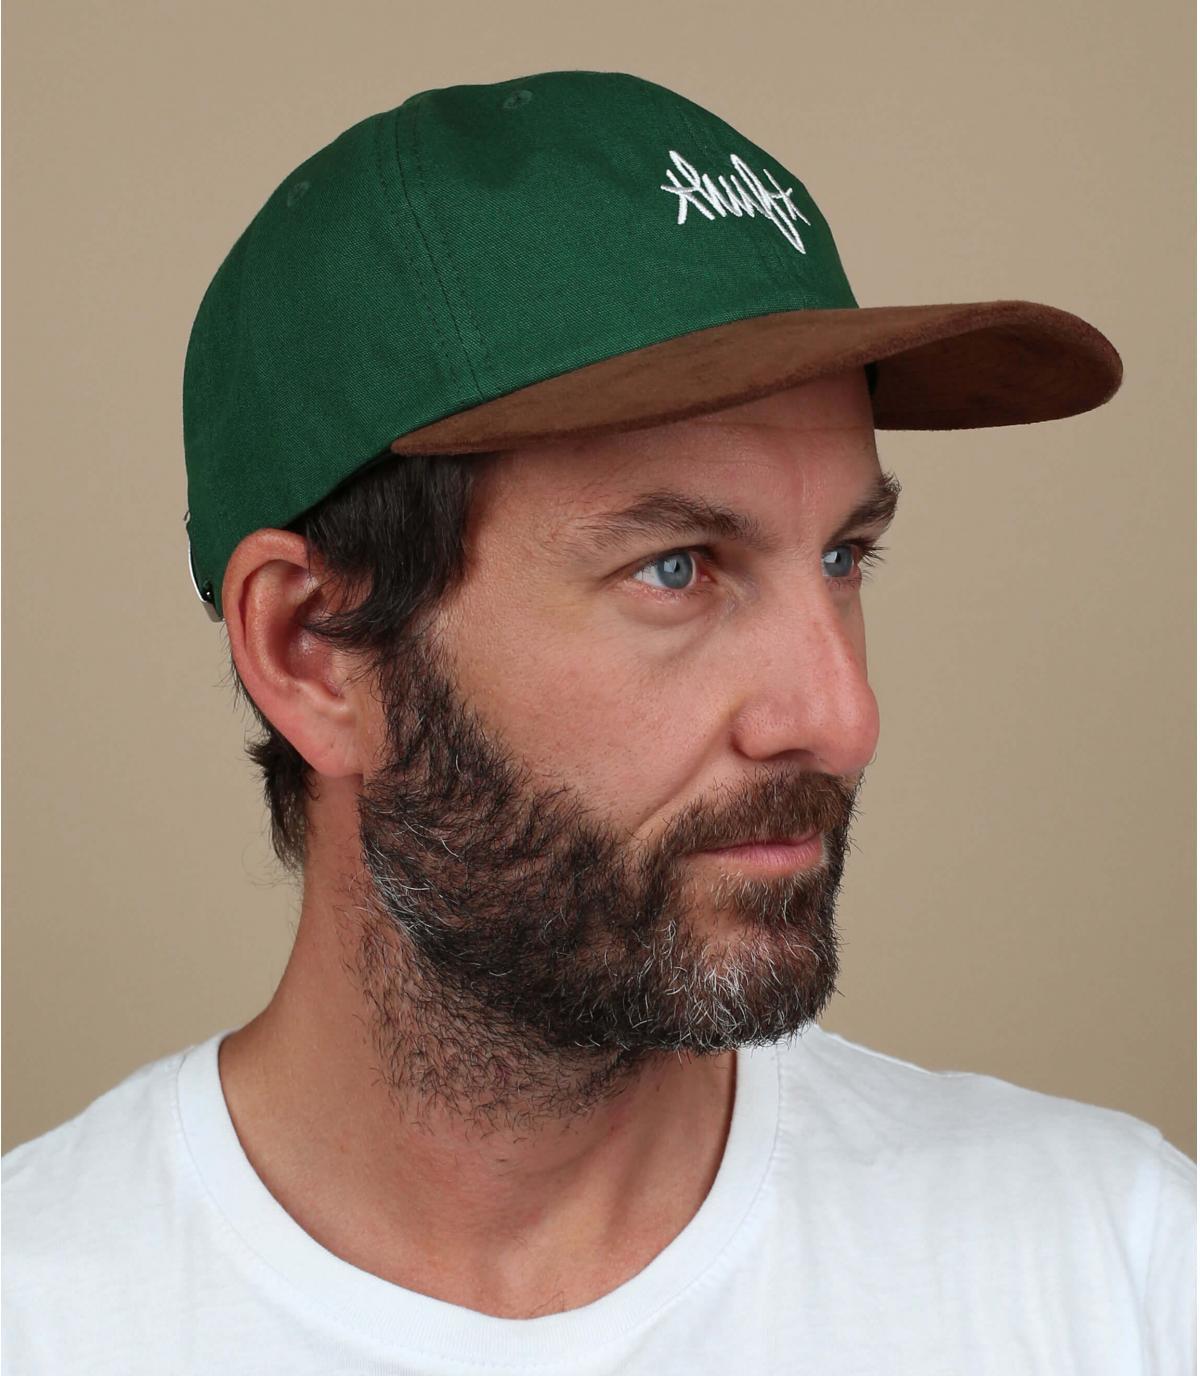 casquette Huf vert suède